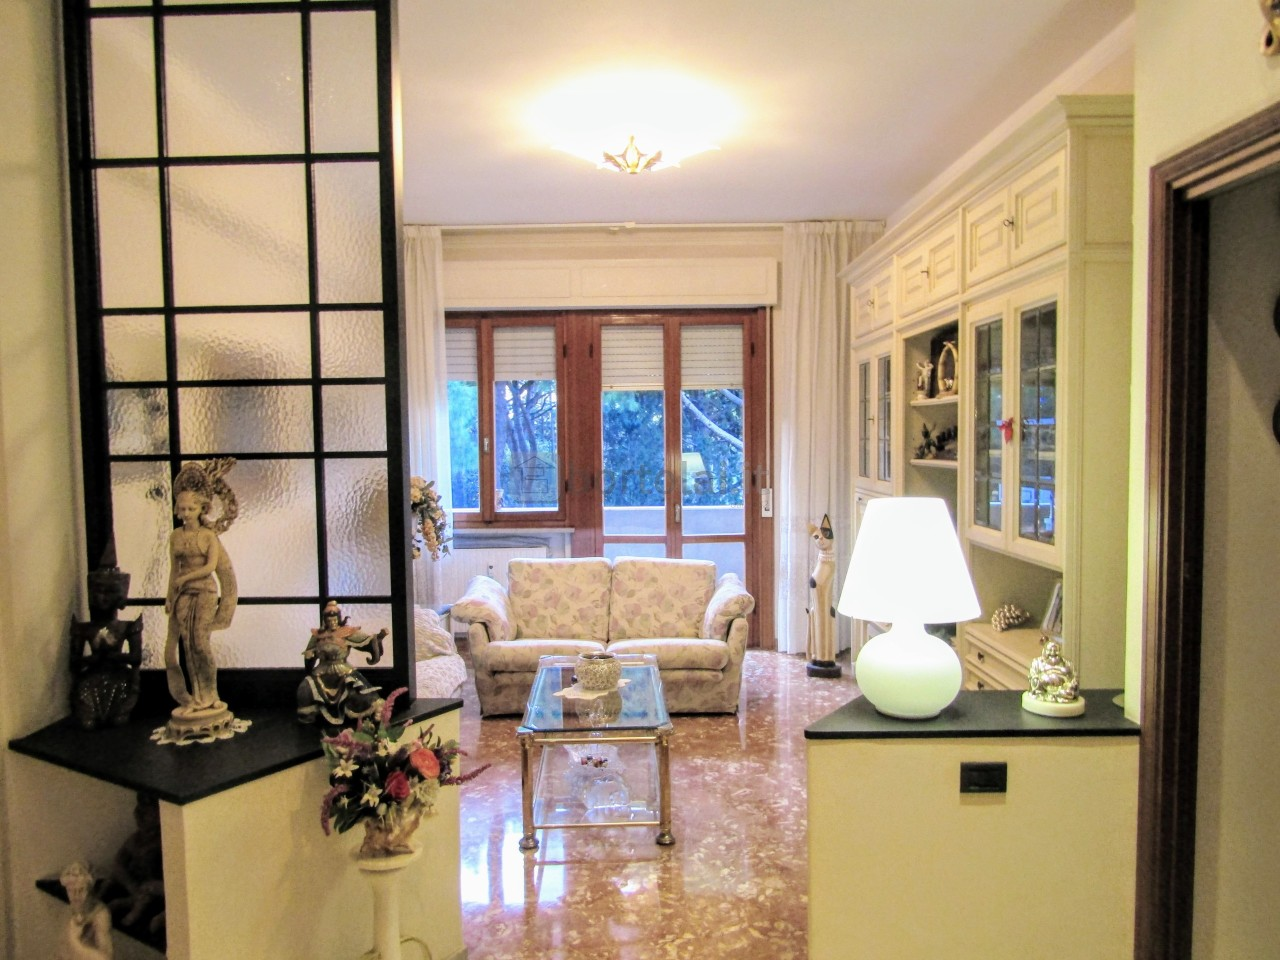 genova vendita quart: quarto immobiliare bortolai.it srl